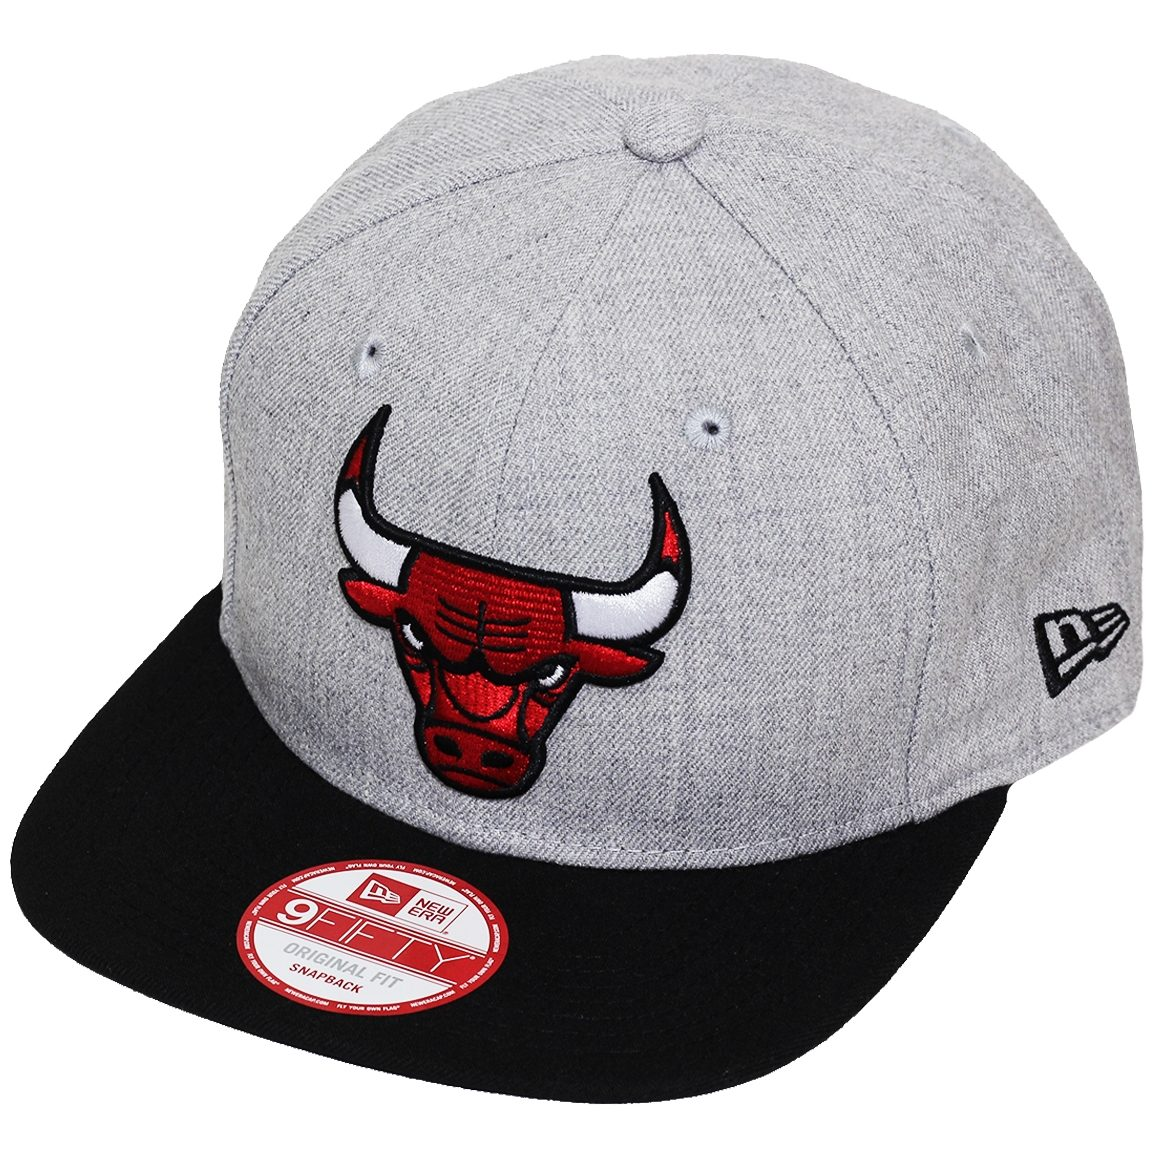 boné new era aba reta snapback nba chicago bulls heather gre. Carregando  zoom. a8bac17abbe